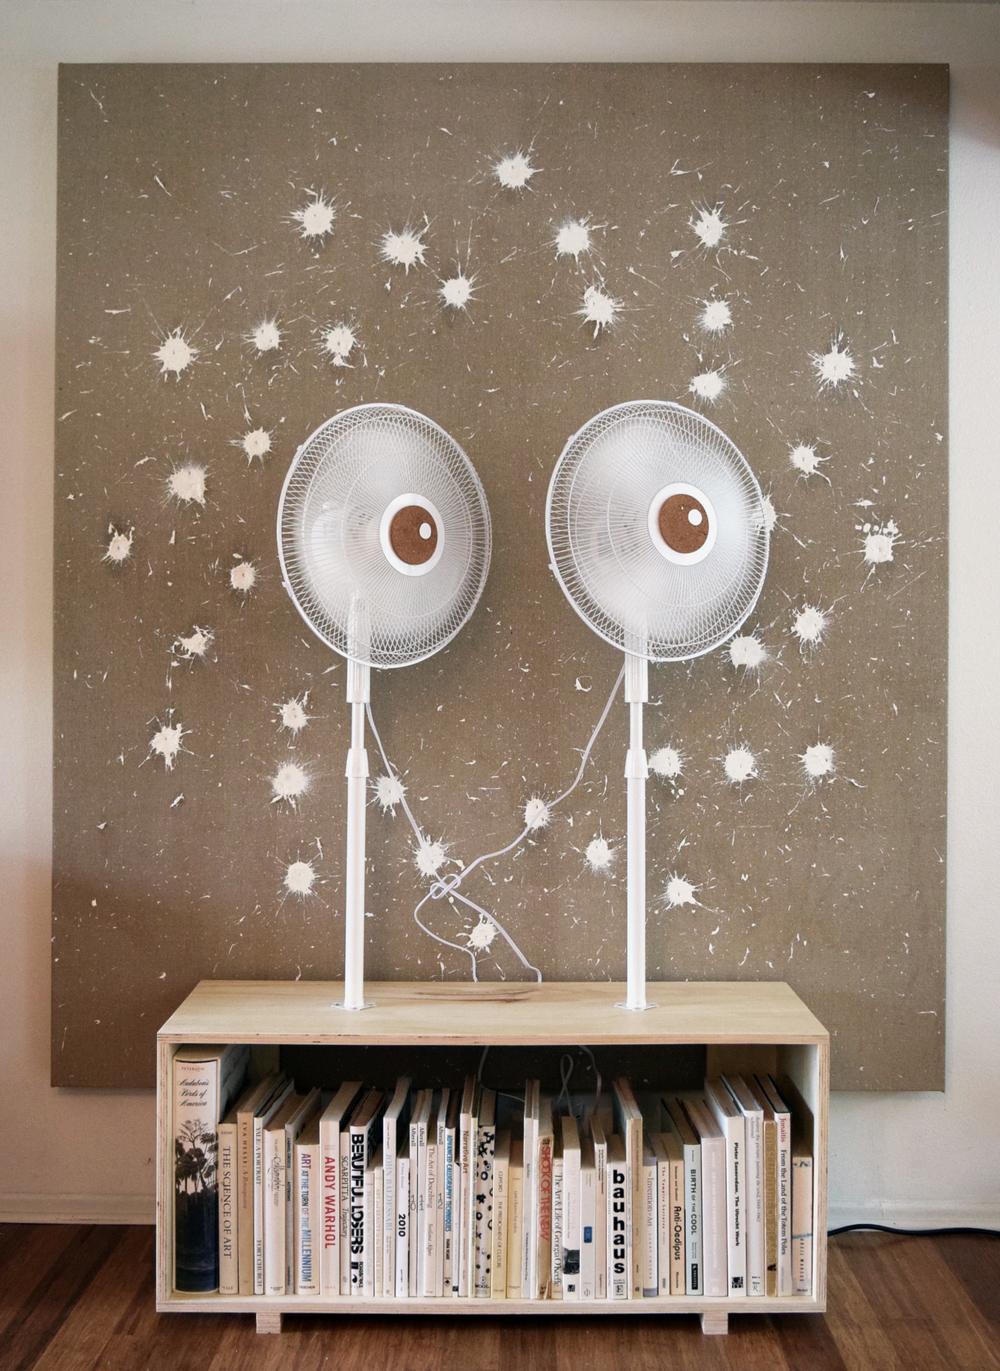 BlowHard - 2016 - Oil paint, hemp, electric fans, cork, paper, wood, books